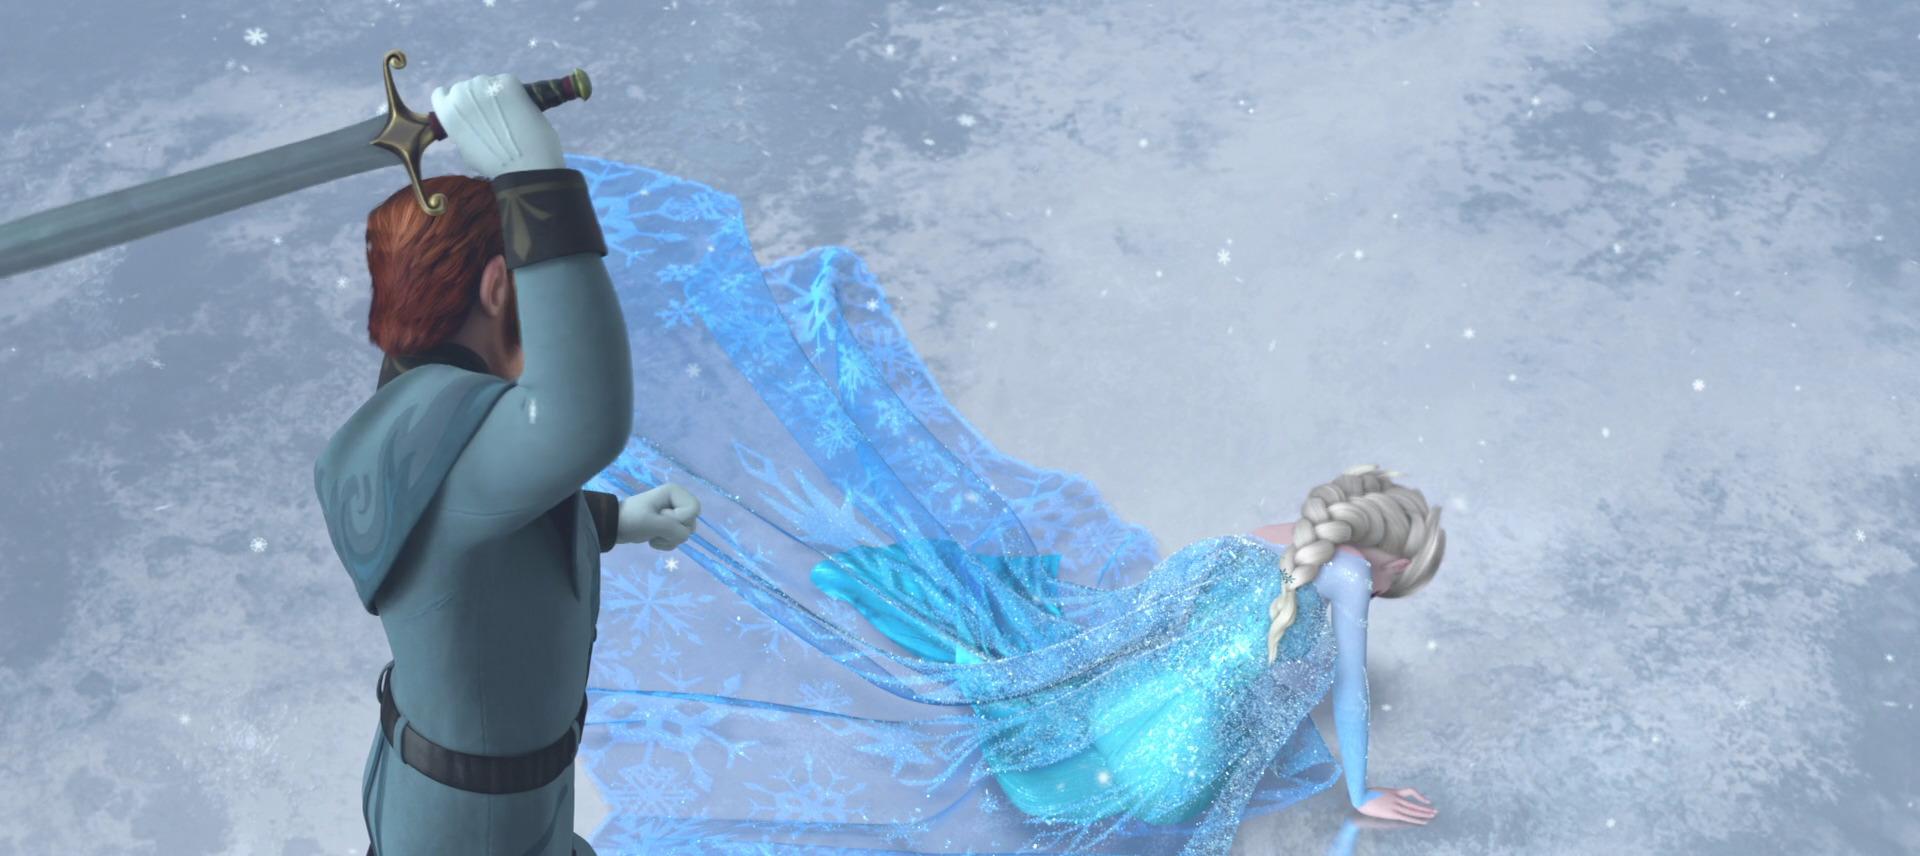 hinh nen frozen elsa 15